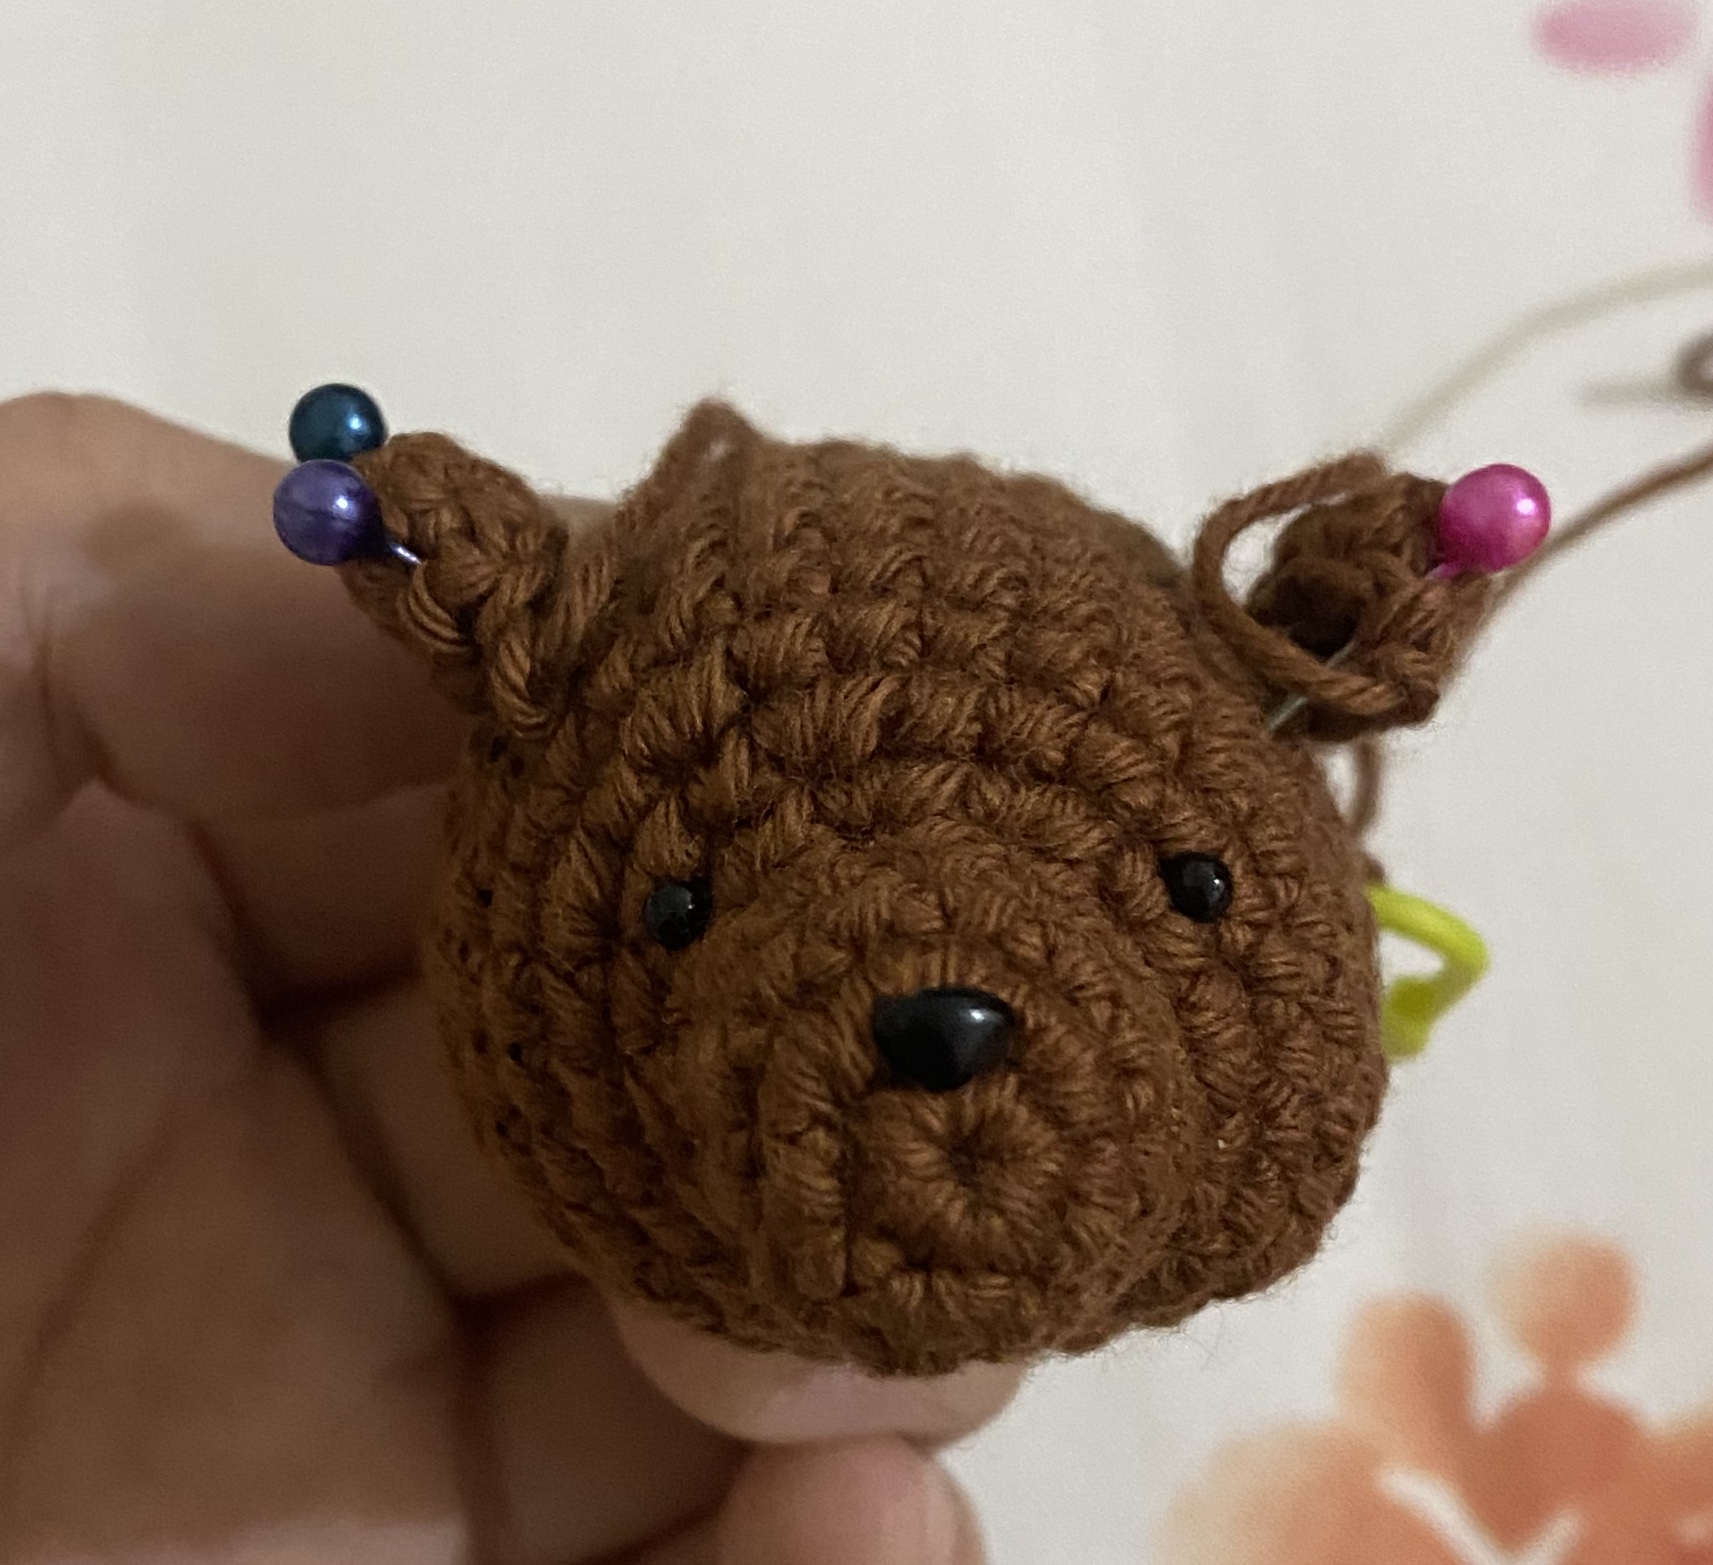 https://storage.googleapis.com/pawlarius-blog-assets/amigurumi/we-bare-bears-chibi/front-position-draft.jpg